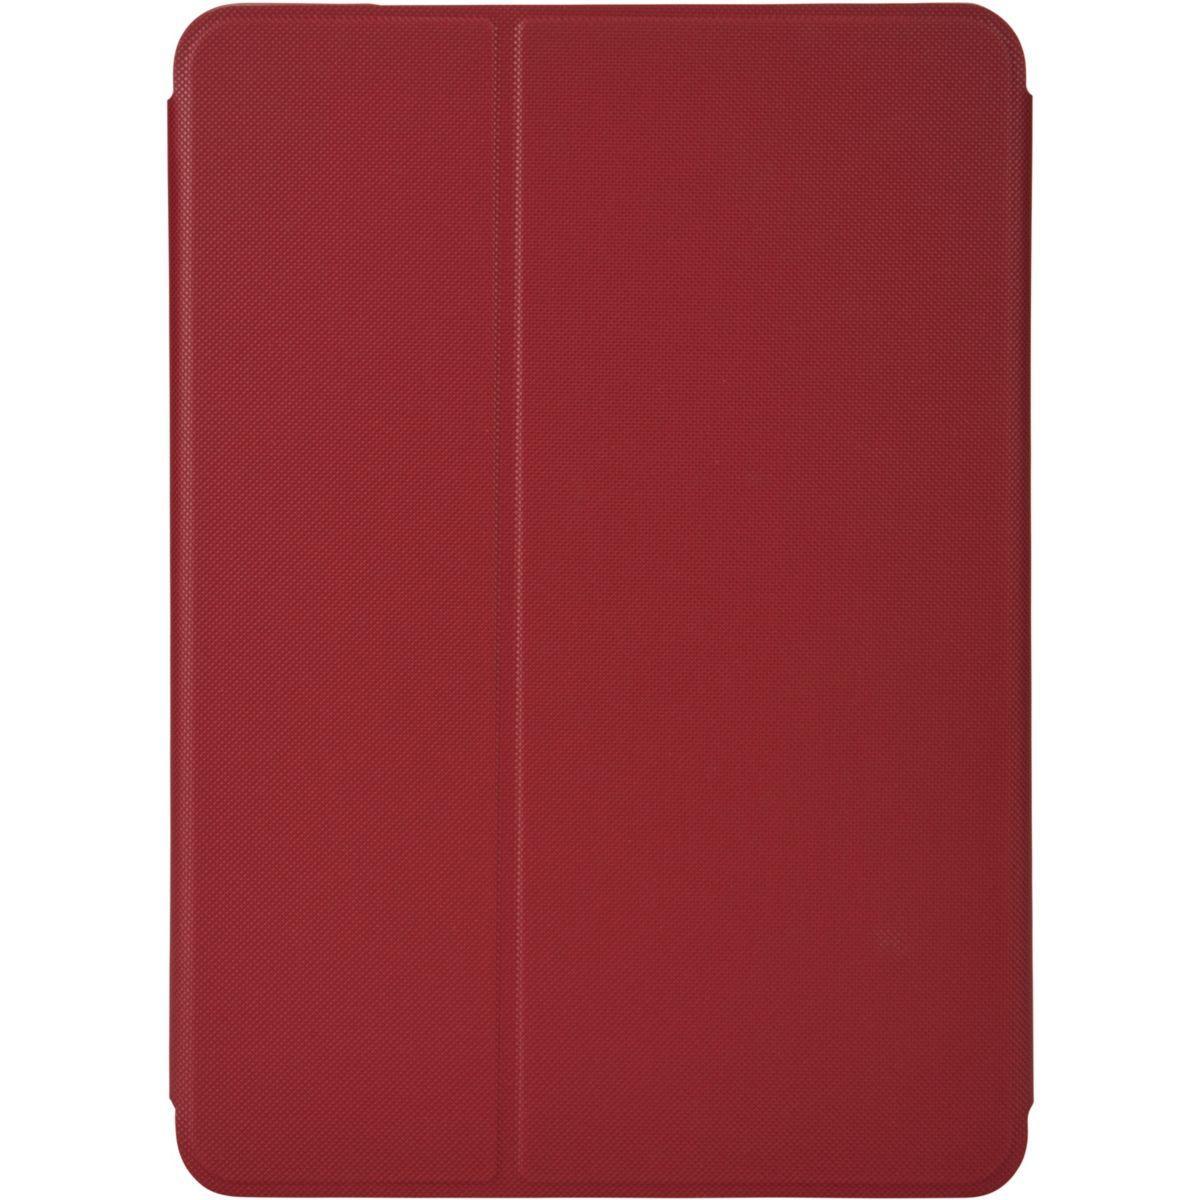 Etui tablette caselogic ipad 9,7 rouge/ air 2/ pro 9.7 - livraison offerte : code premium (photo)